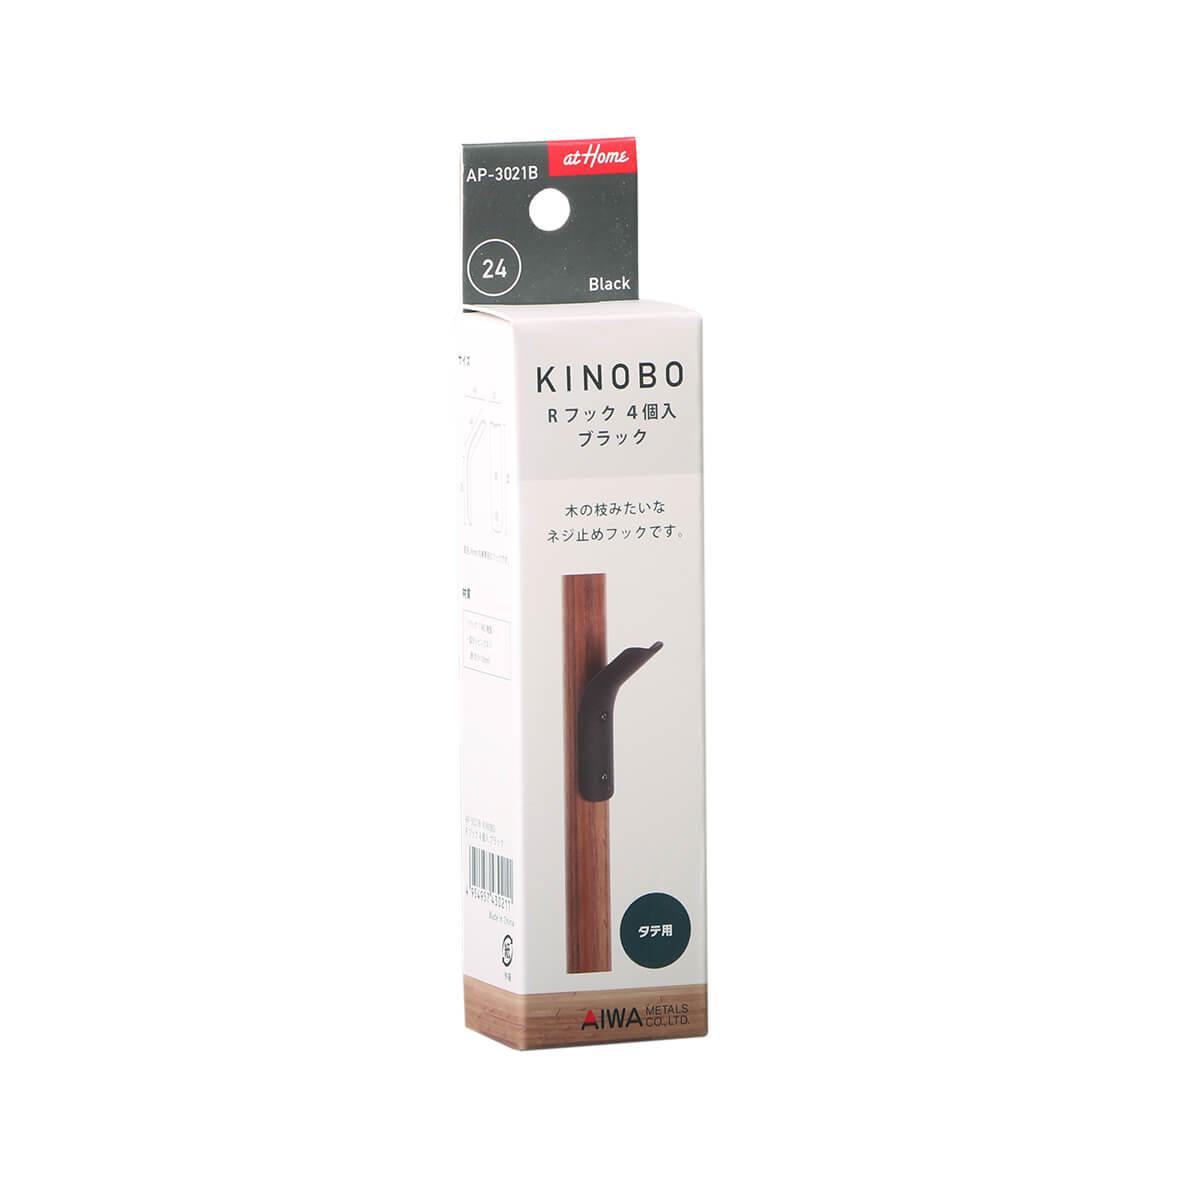 Rフック KINOBO専用 ブラック Φ24 4個入